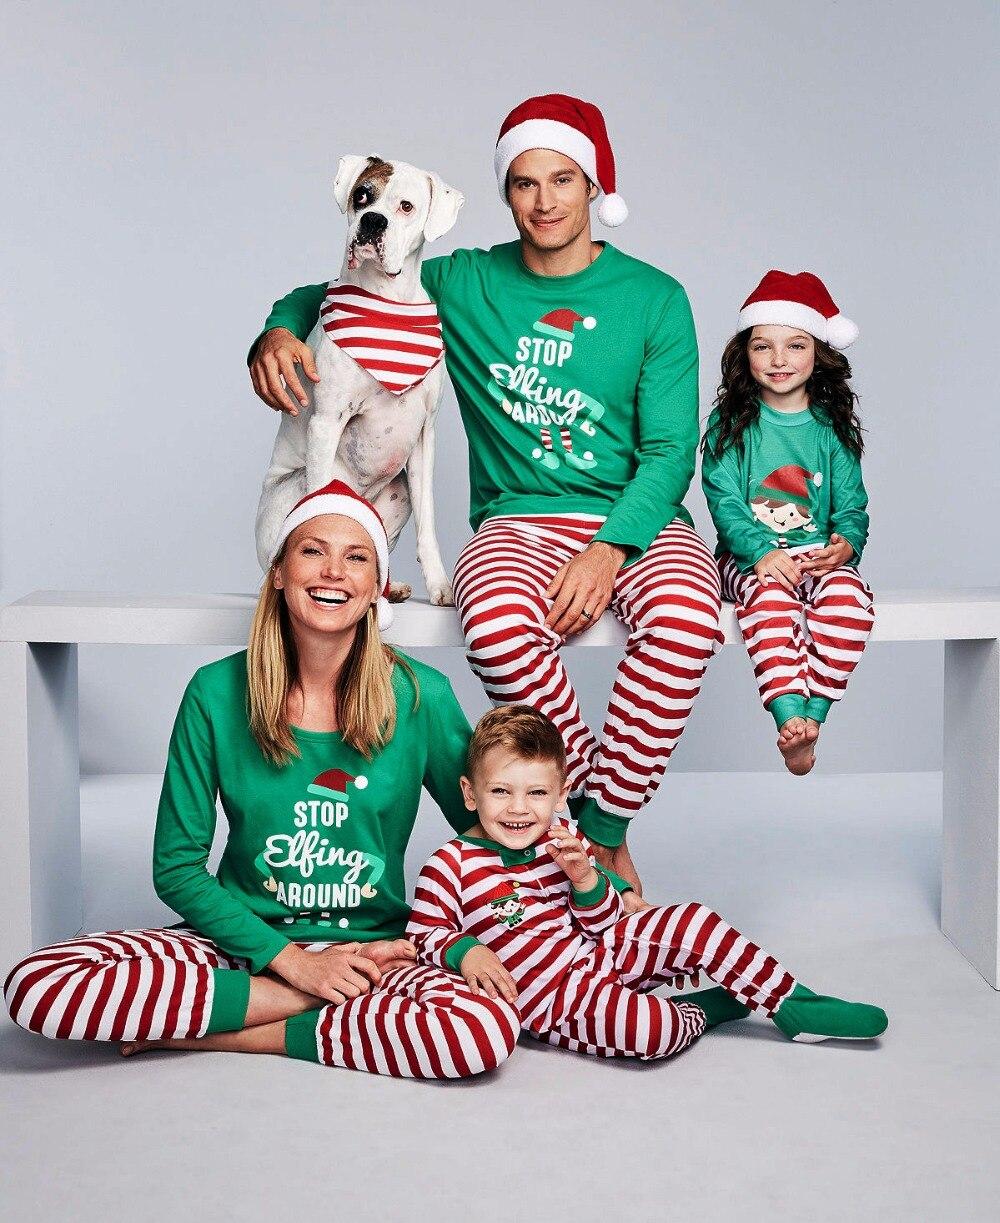 2018 New Christmas Pajamas Set Family Matching Outfits Green Striped Pyjamas Set Sleepwear Nightwear Xmas Baby Romper family christmas pajamas set striped pyjamas set family look matching family christmas pajamas navidad family matching clothes